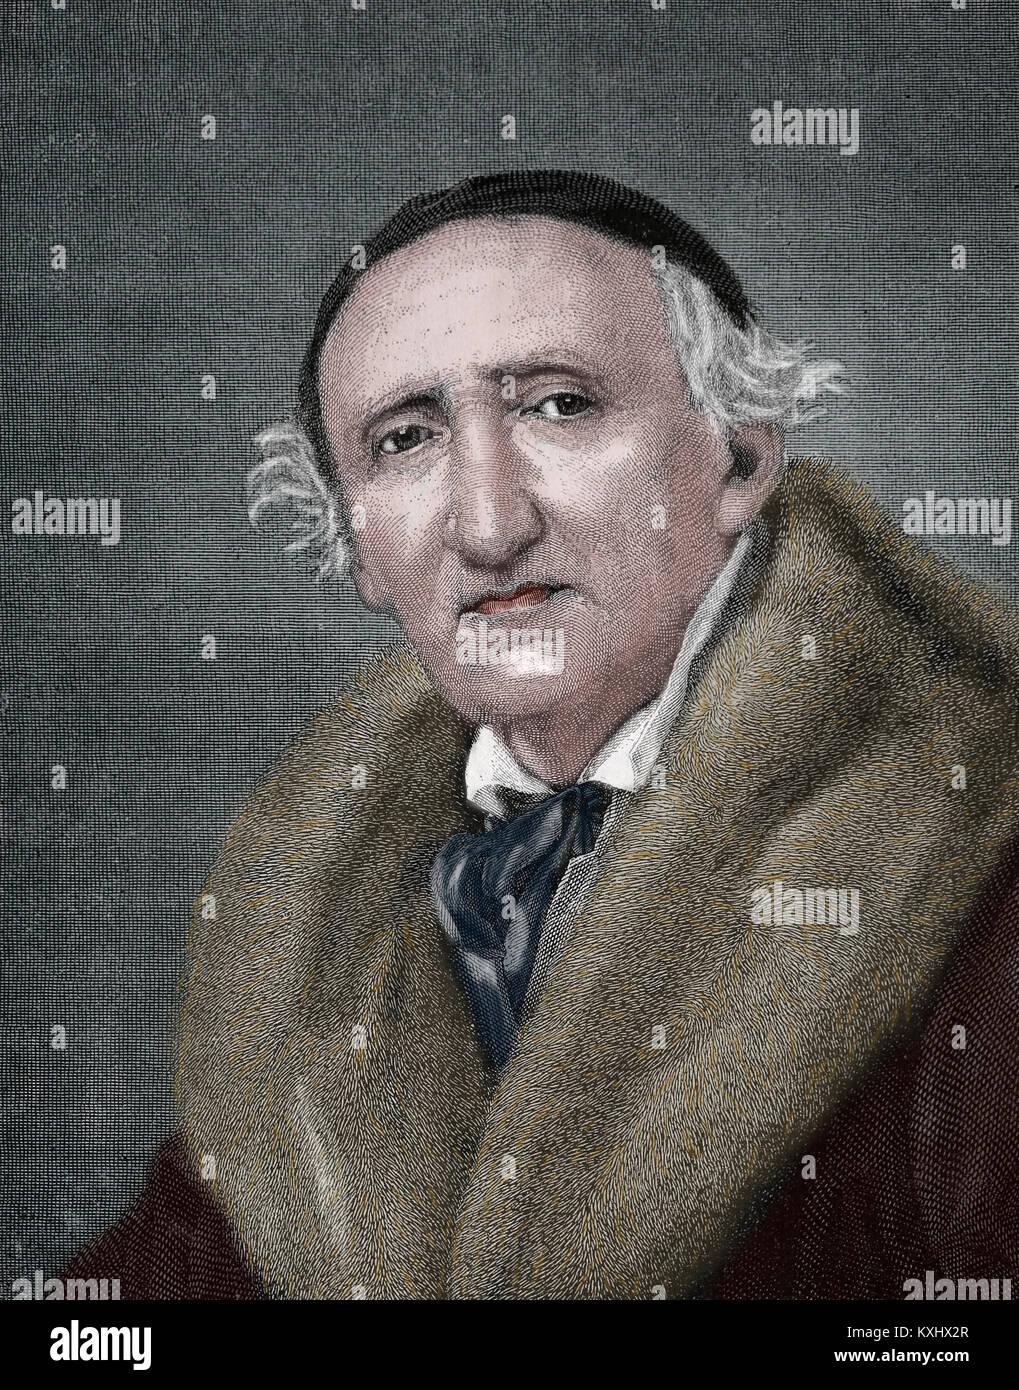 Johann Gottfried Schadow (1764-1850). Escultor de Prusia alemana. Grabado, 1883. Foto de stock